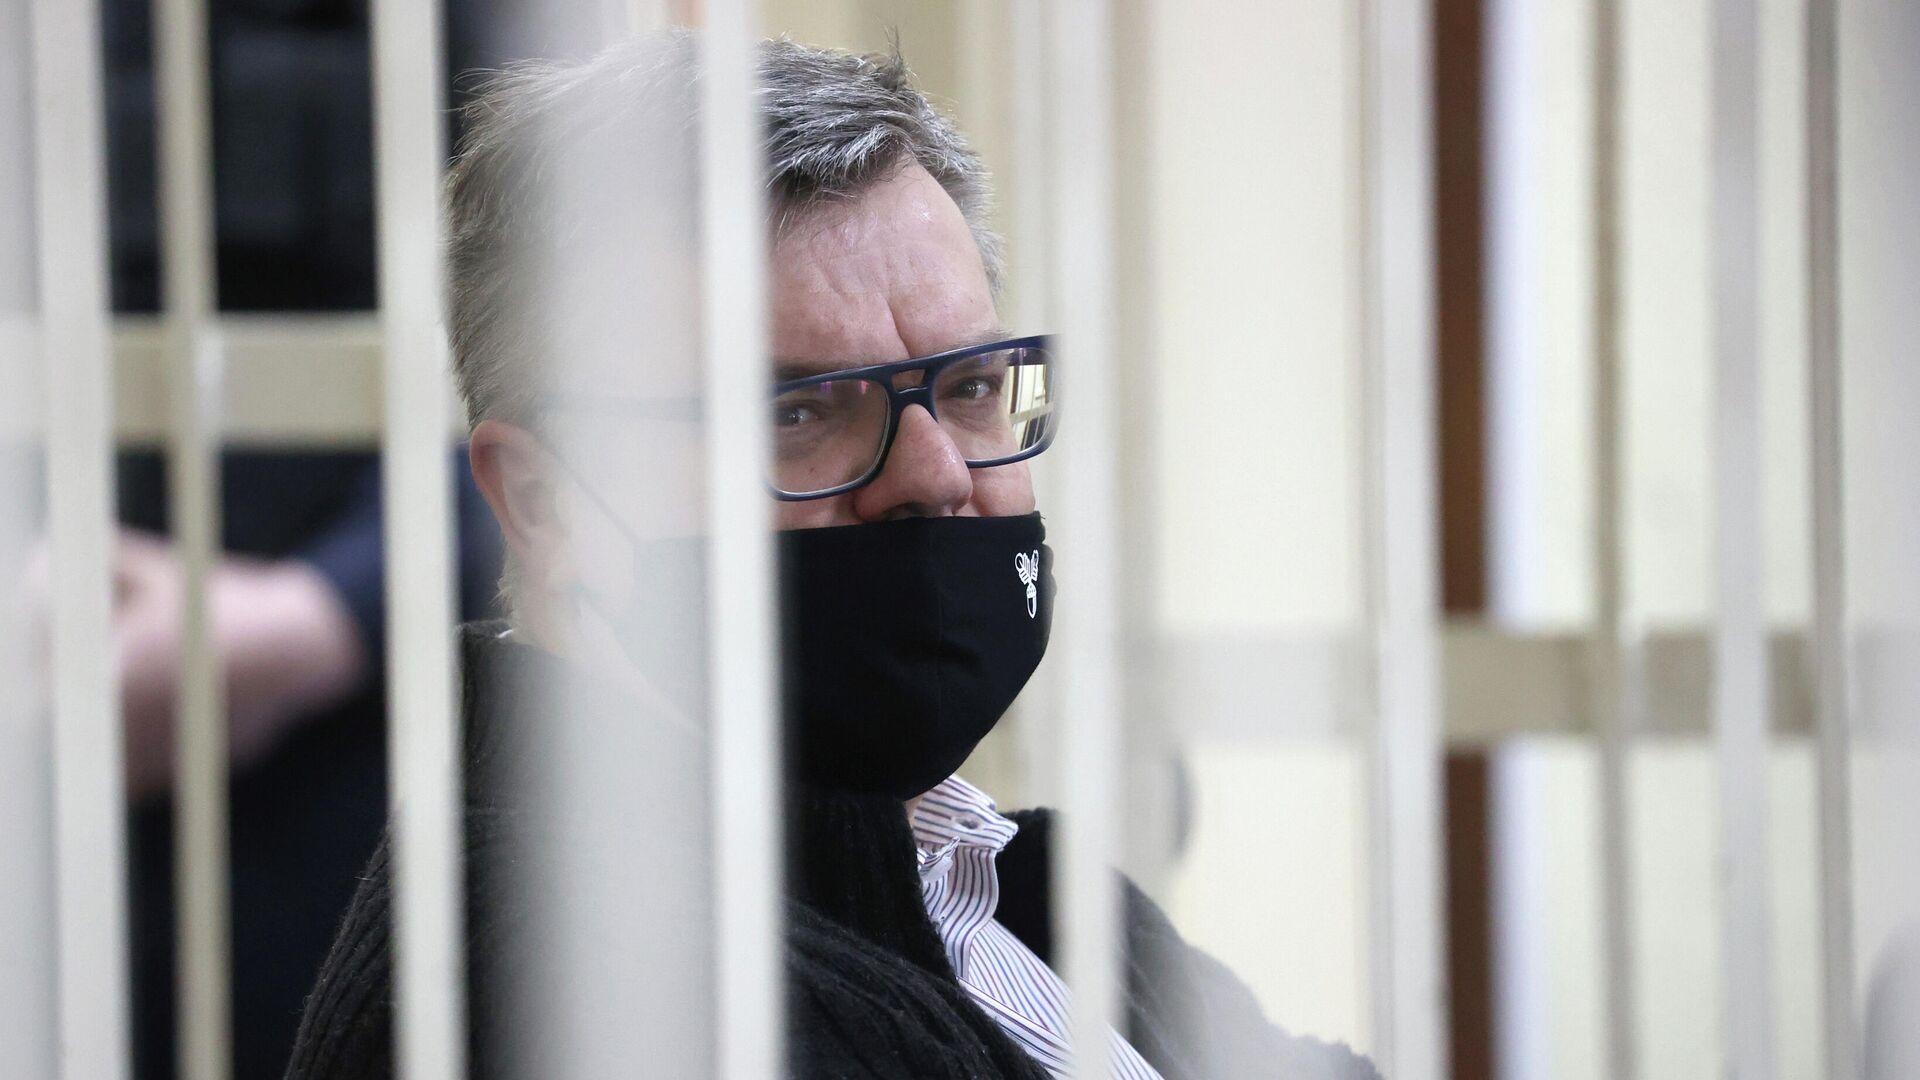 Виктор Бабарико в суде - РИА Новости, 1920, 09.08.2021